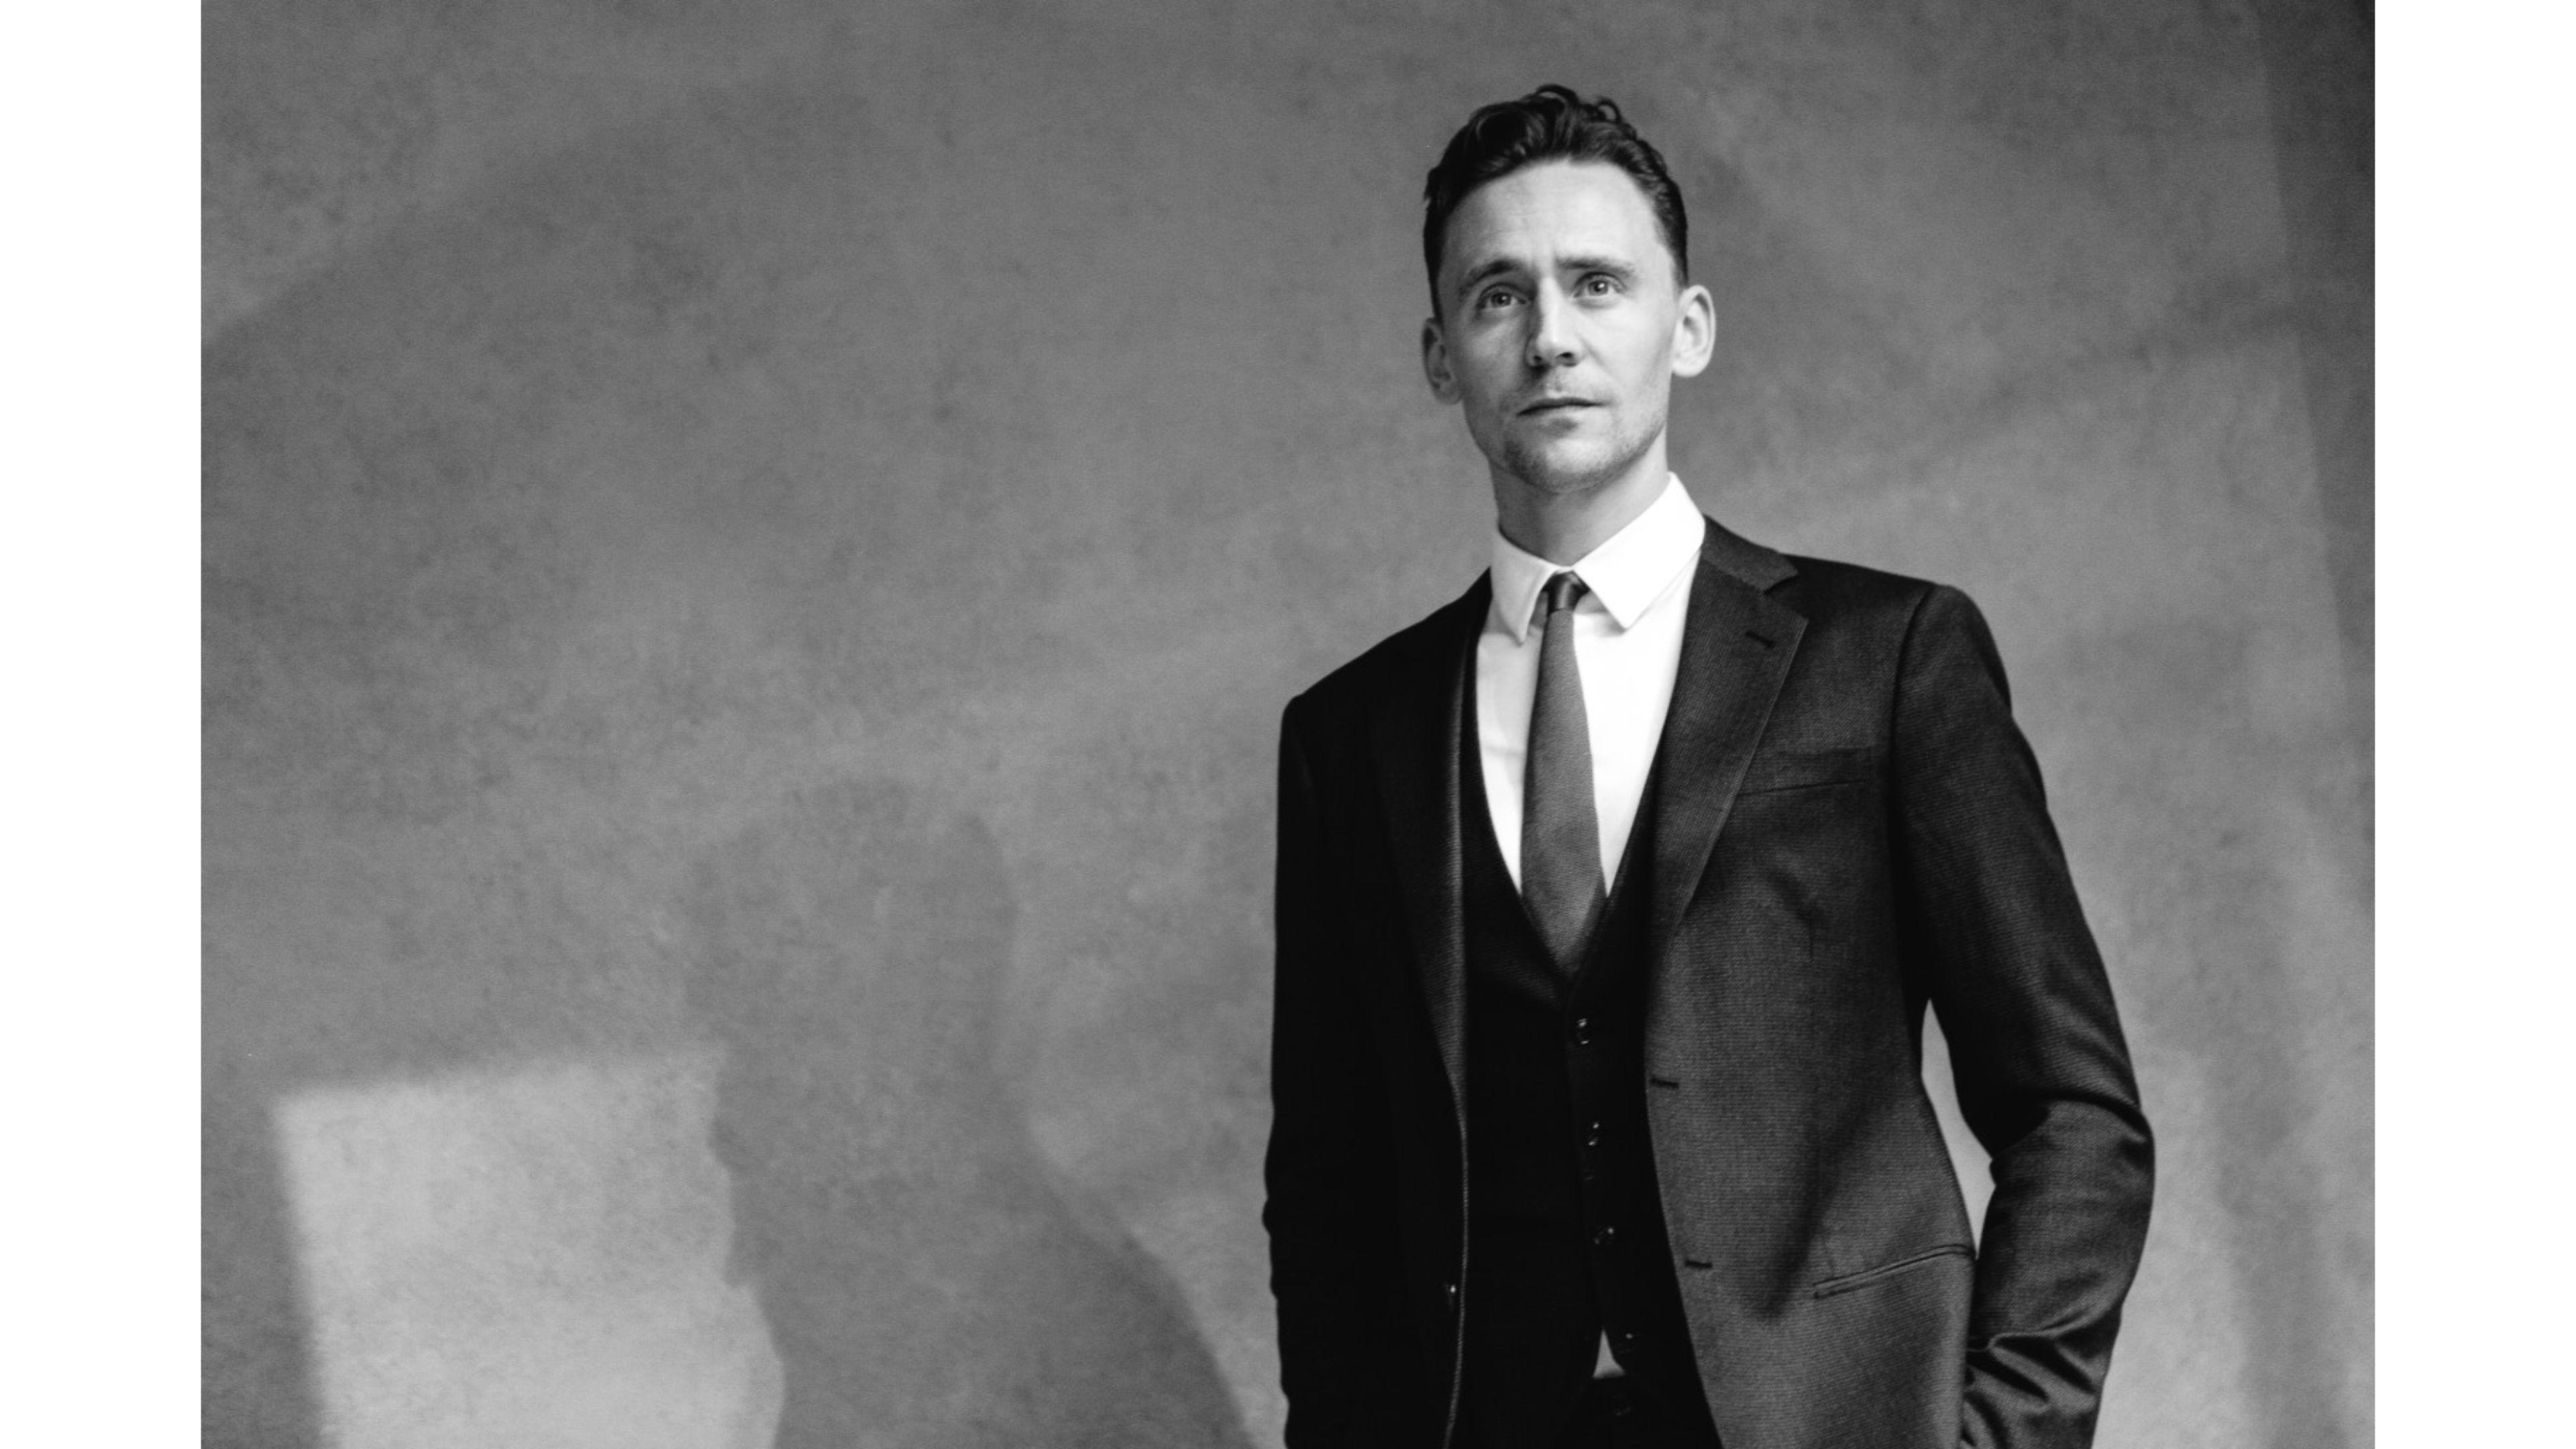 New 2016 Tom Hiddleston Wallpaper